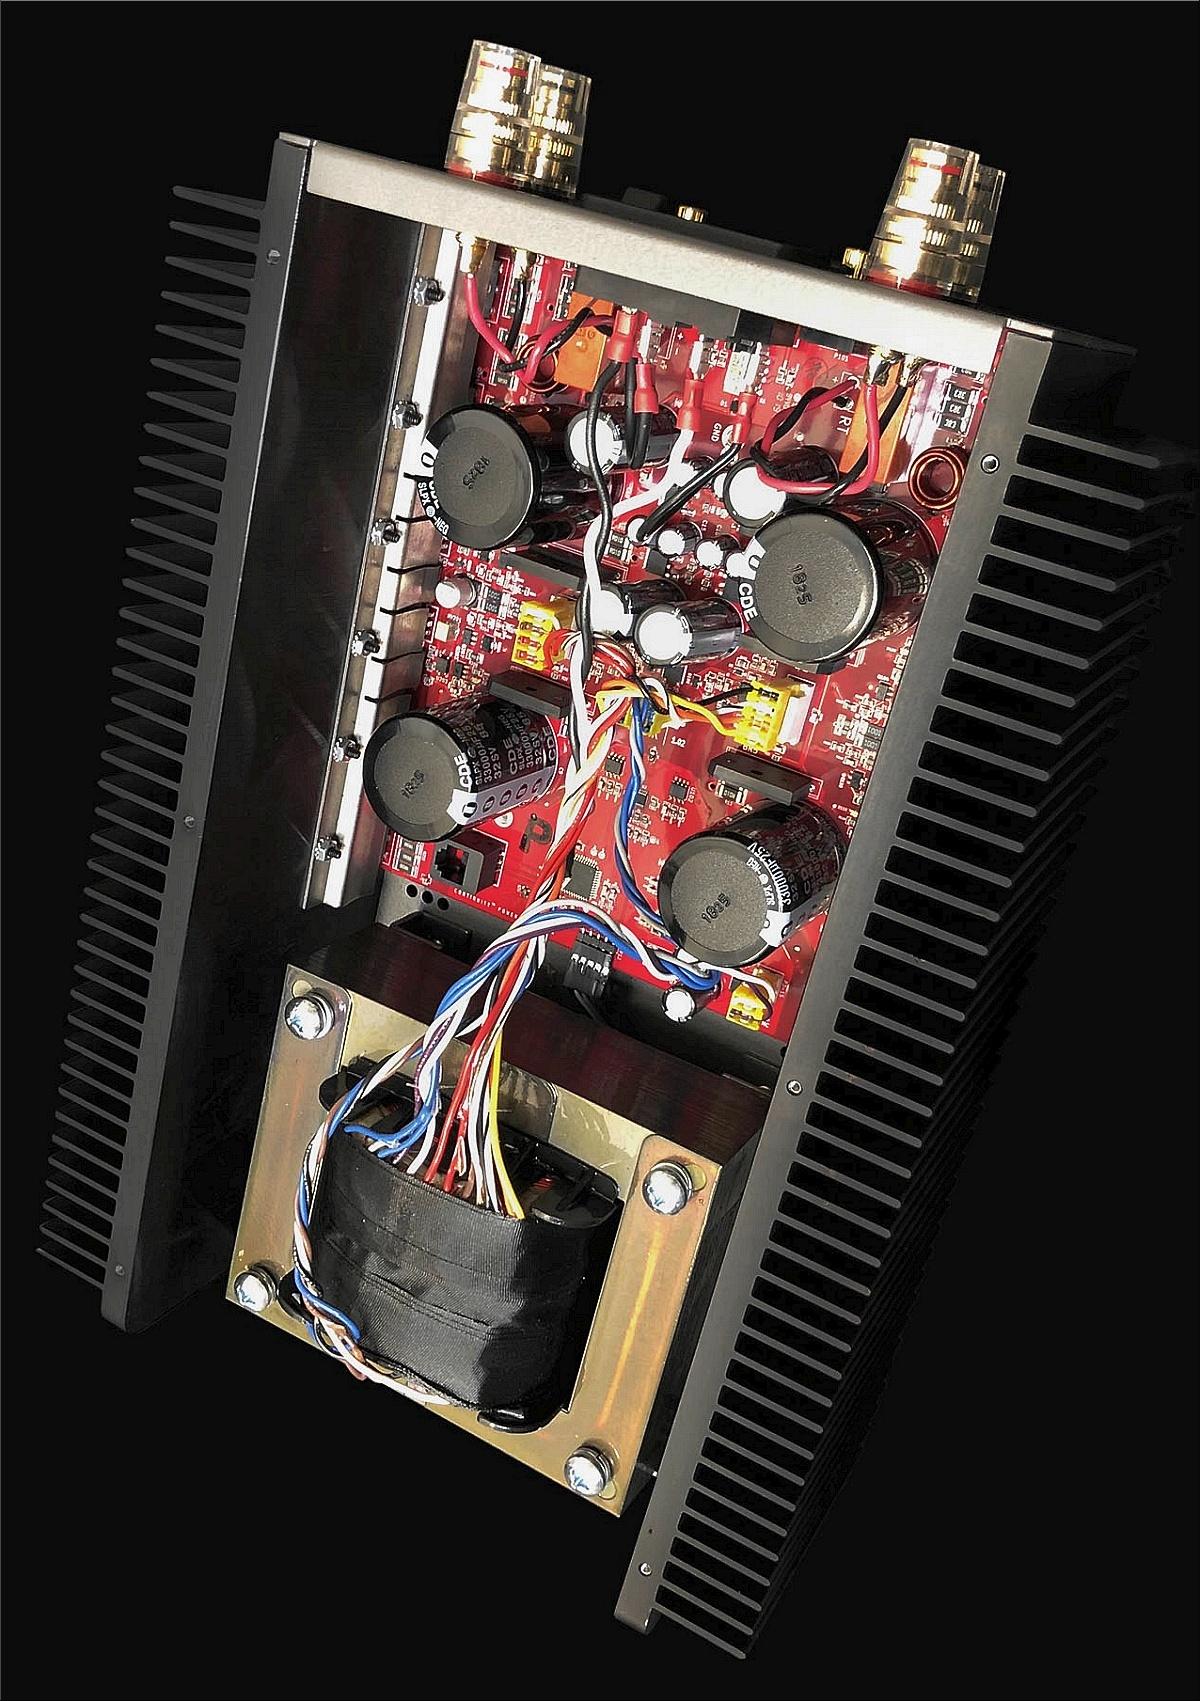 Schiit-Aegir-poweramp-inside-rotated.jpg